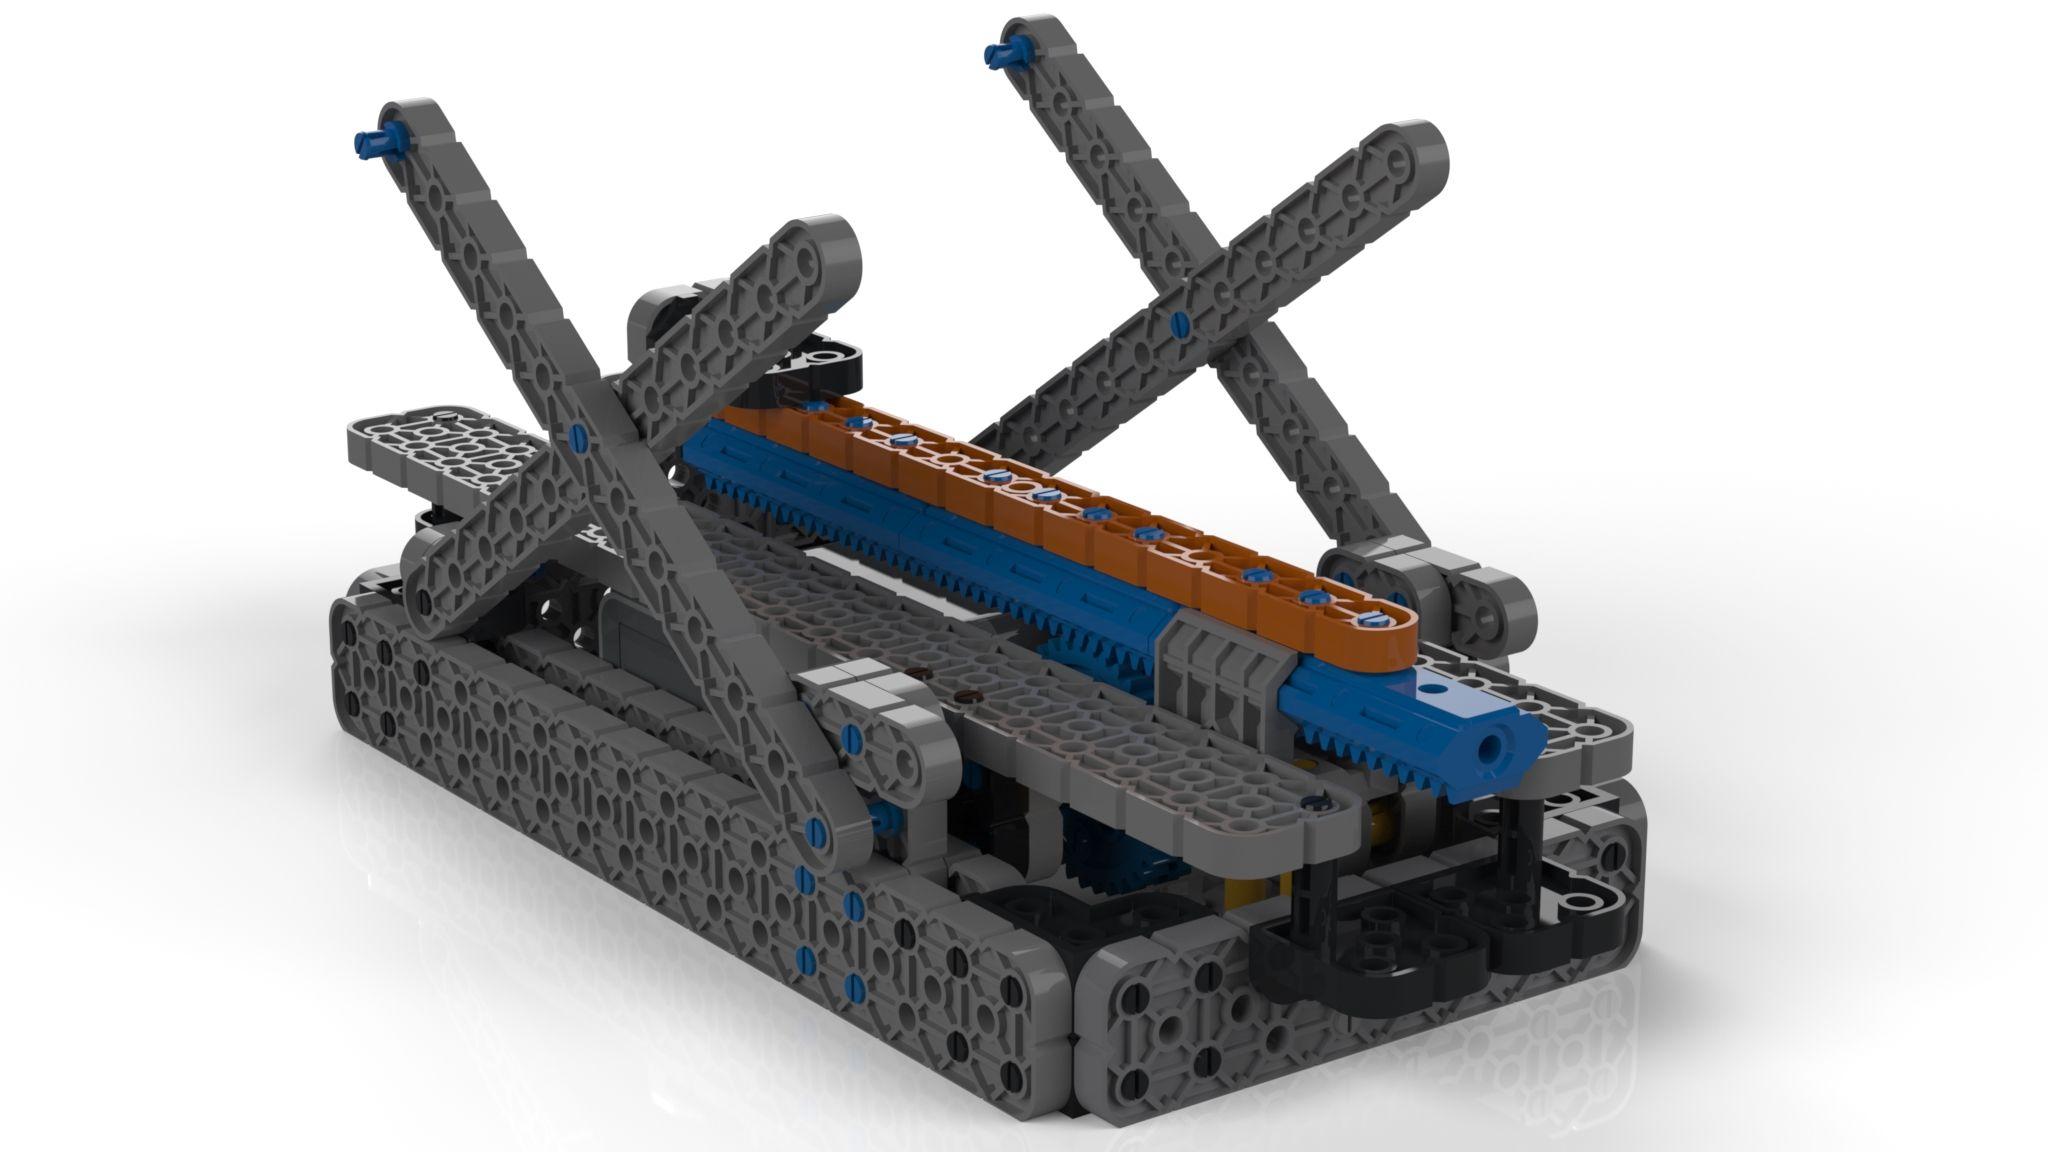 Vex-iq-elevation-mechanics-lcs---fabrica-de-nerdes-01-3500-3500